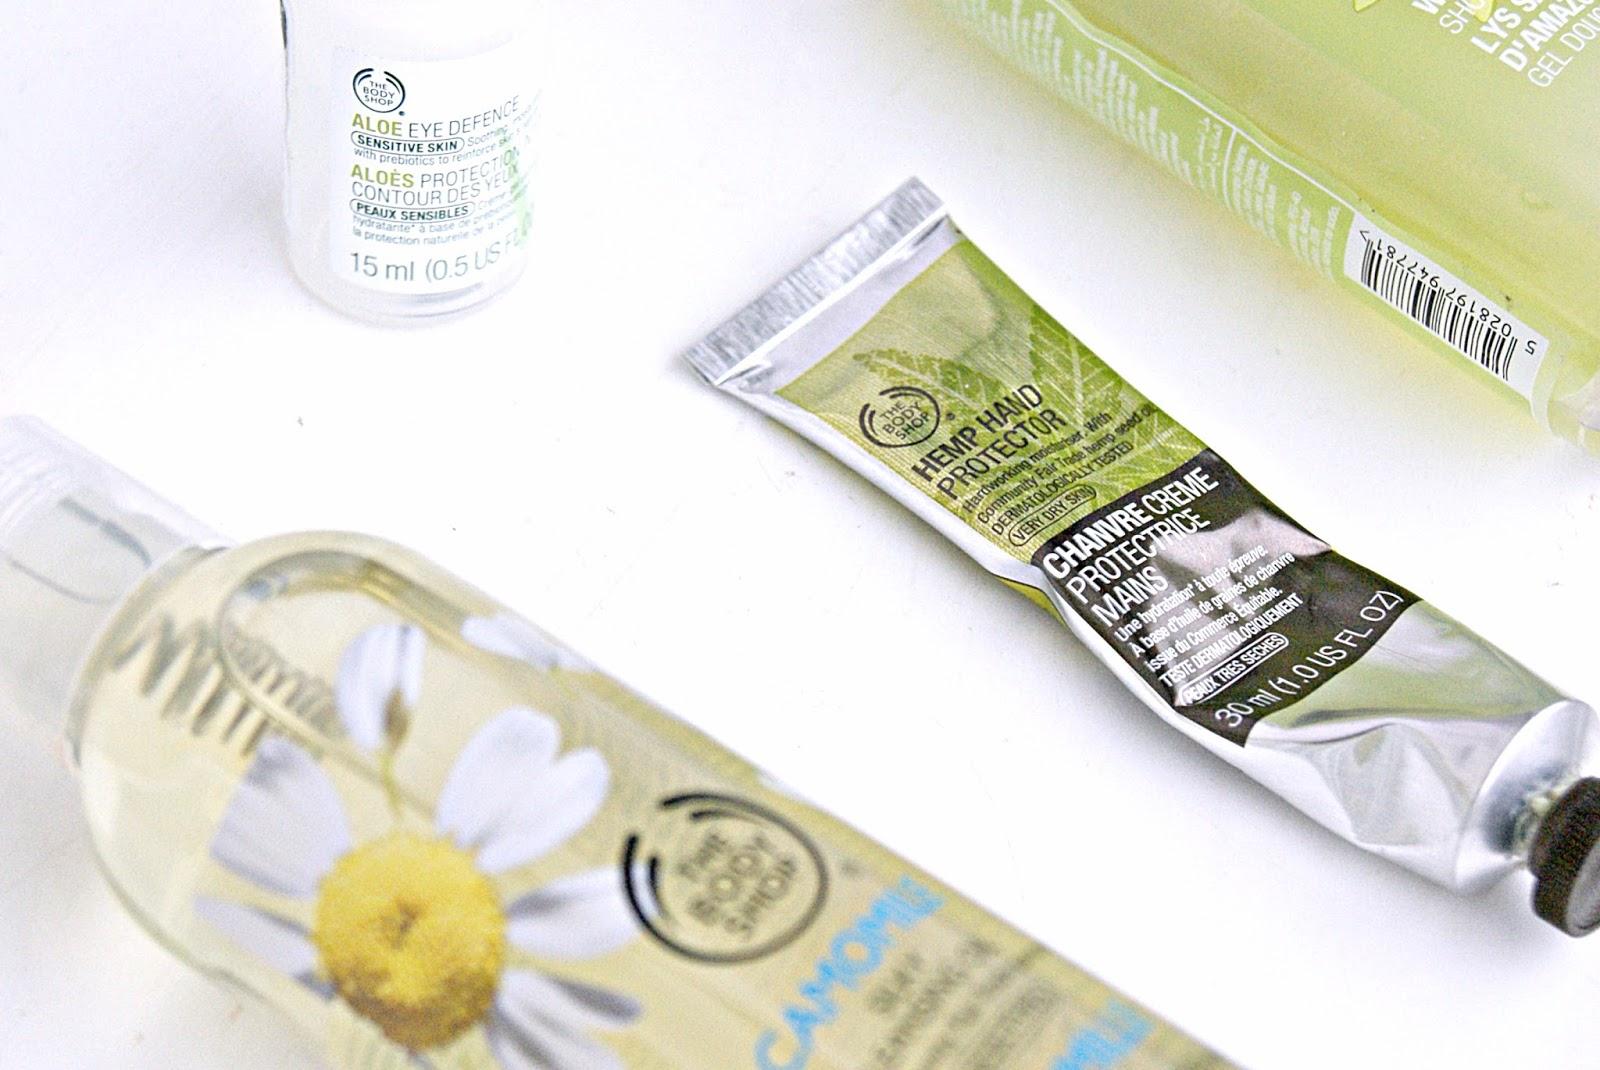 body shop aloe review cream moisturiser cleanser